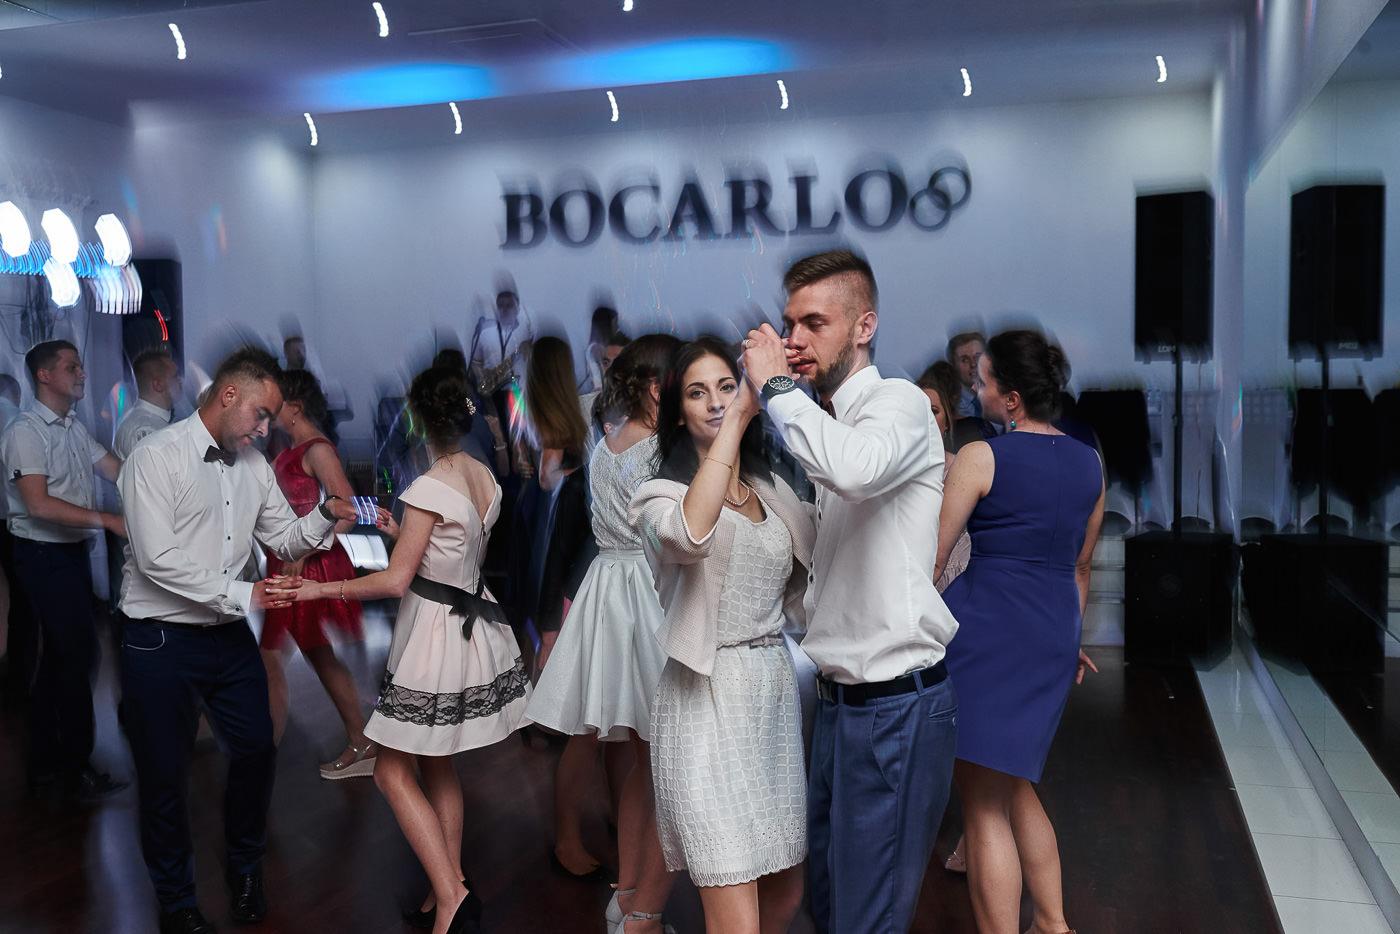 Fotograf_rzeszow-Slub_Bocarlo75